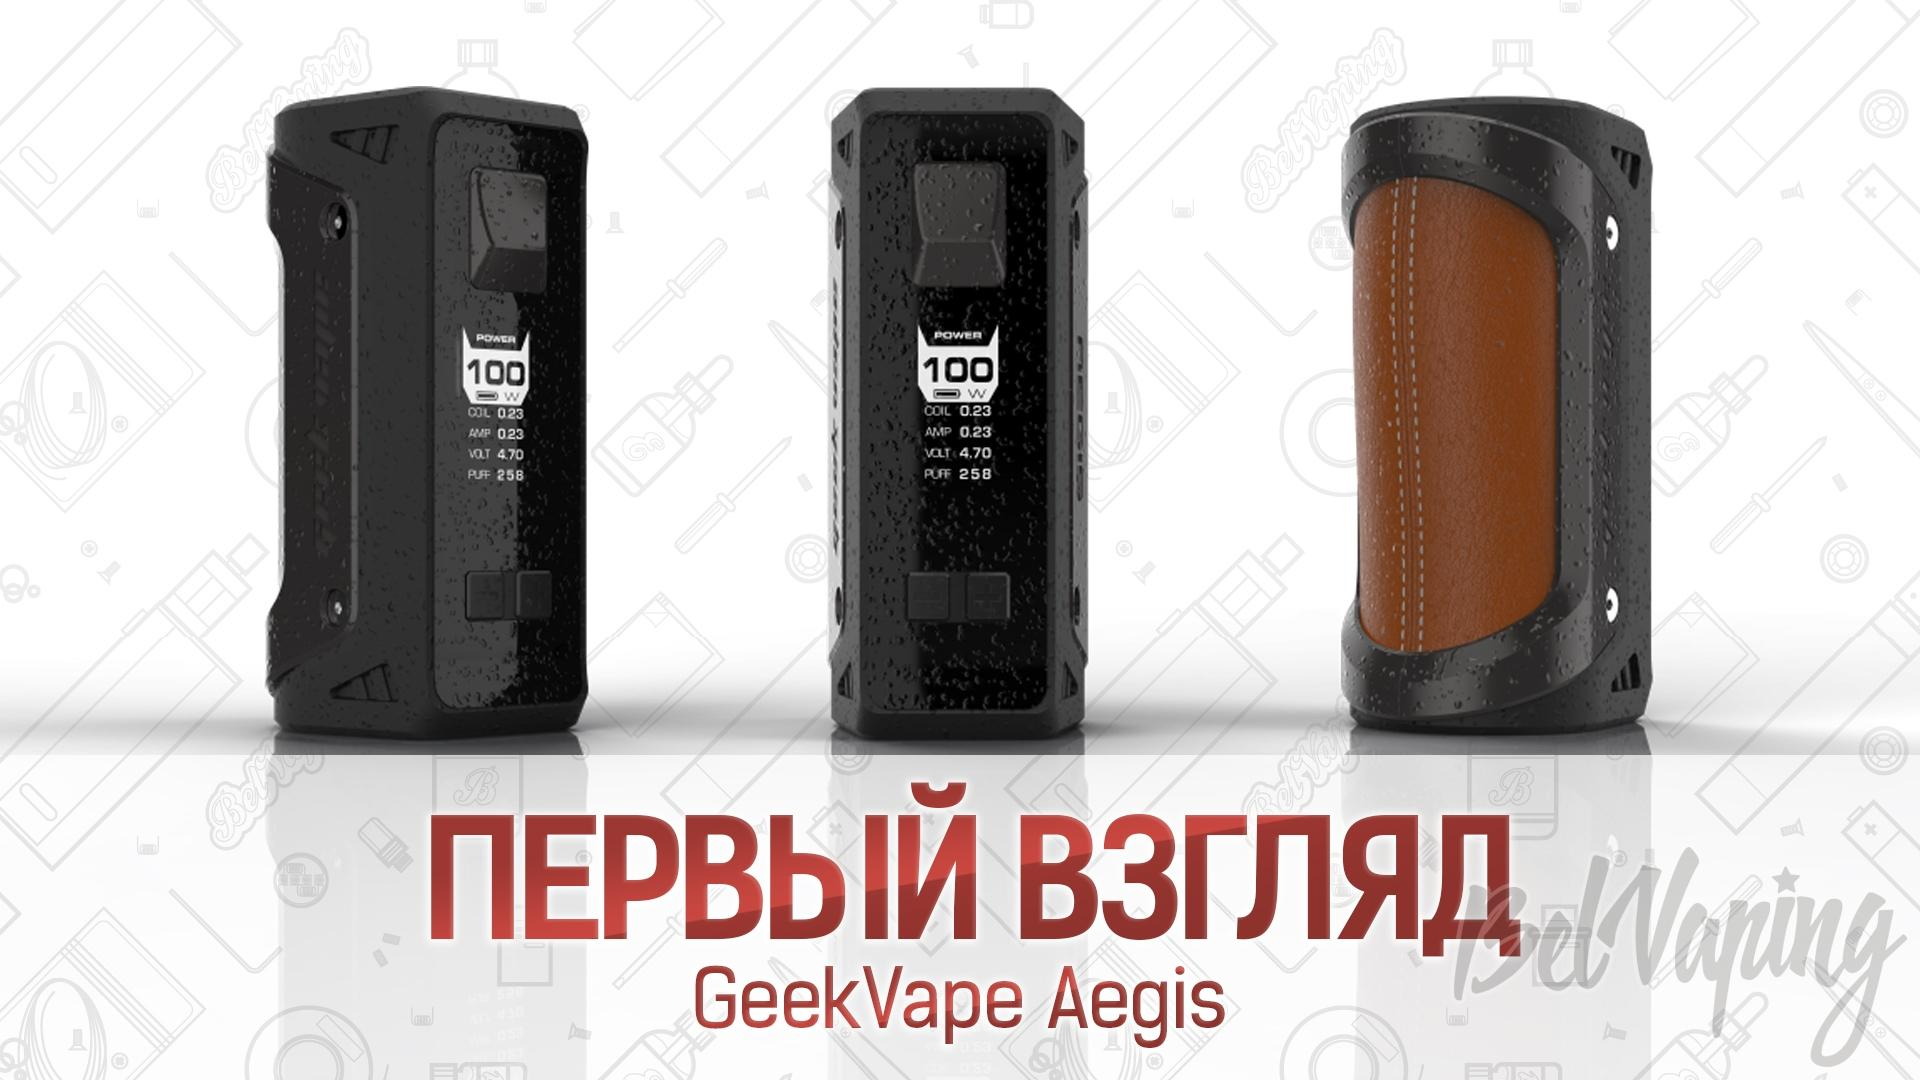 GeekVape Aegis. Первый взгляд